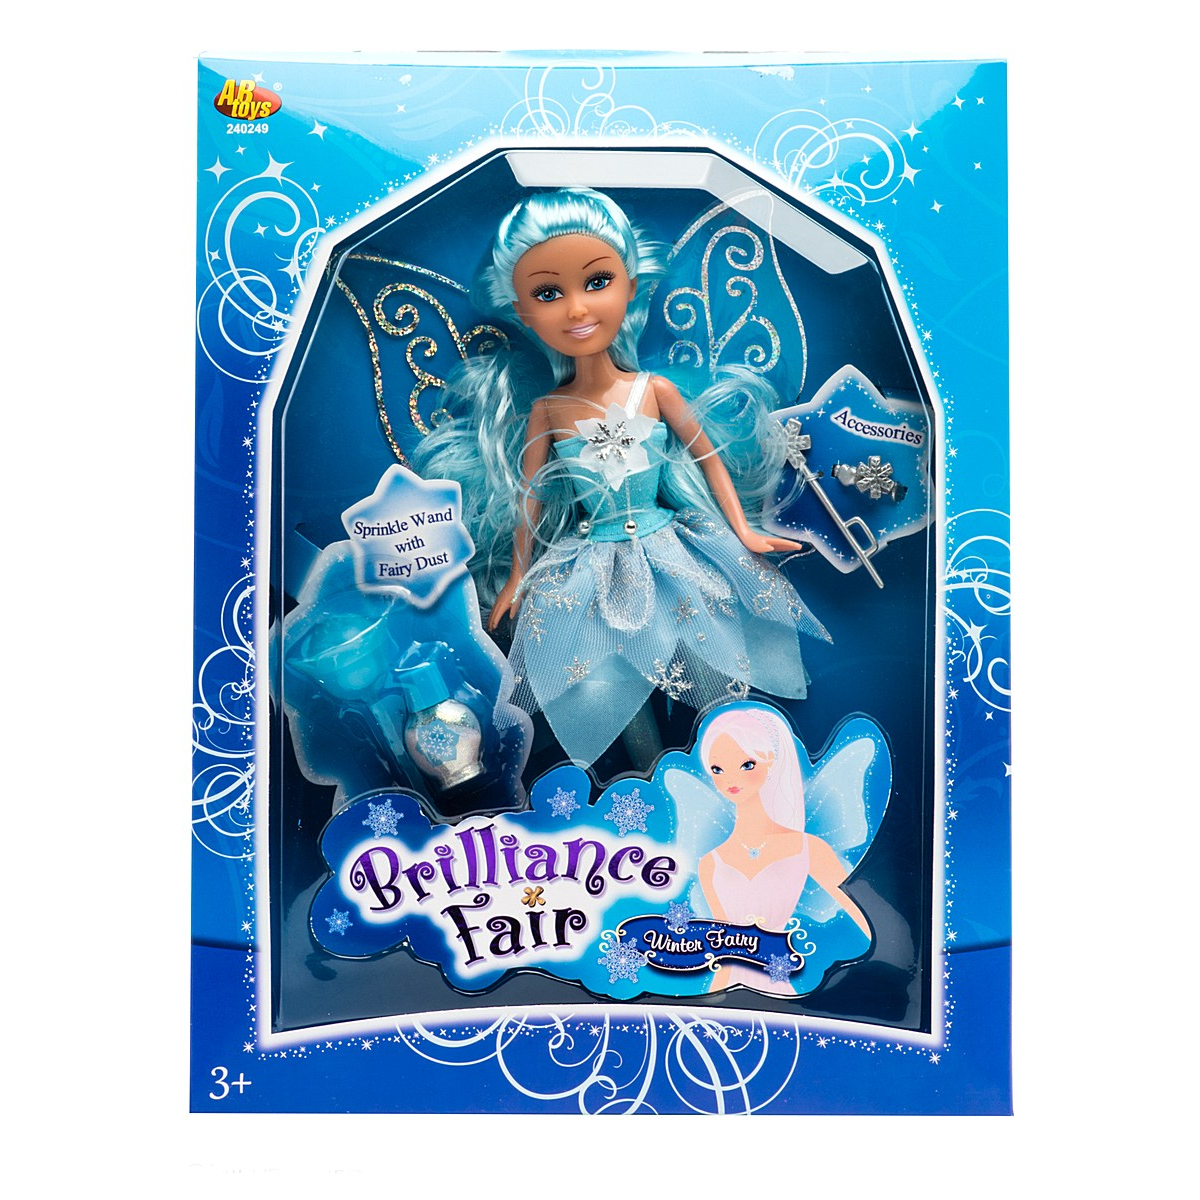 Кукла Brilliance Fair с аксессуарами - Snowstorm, 26.7 см